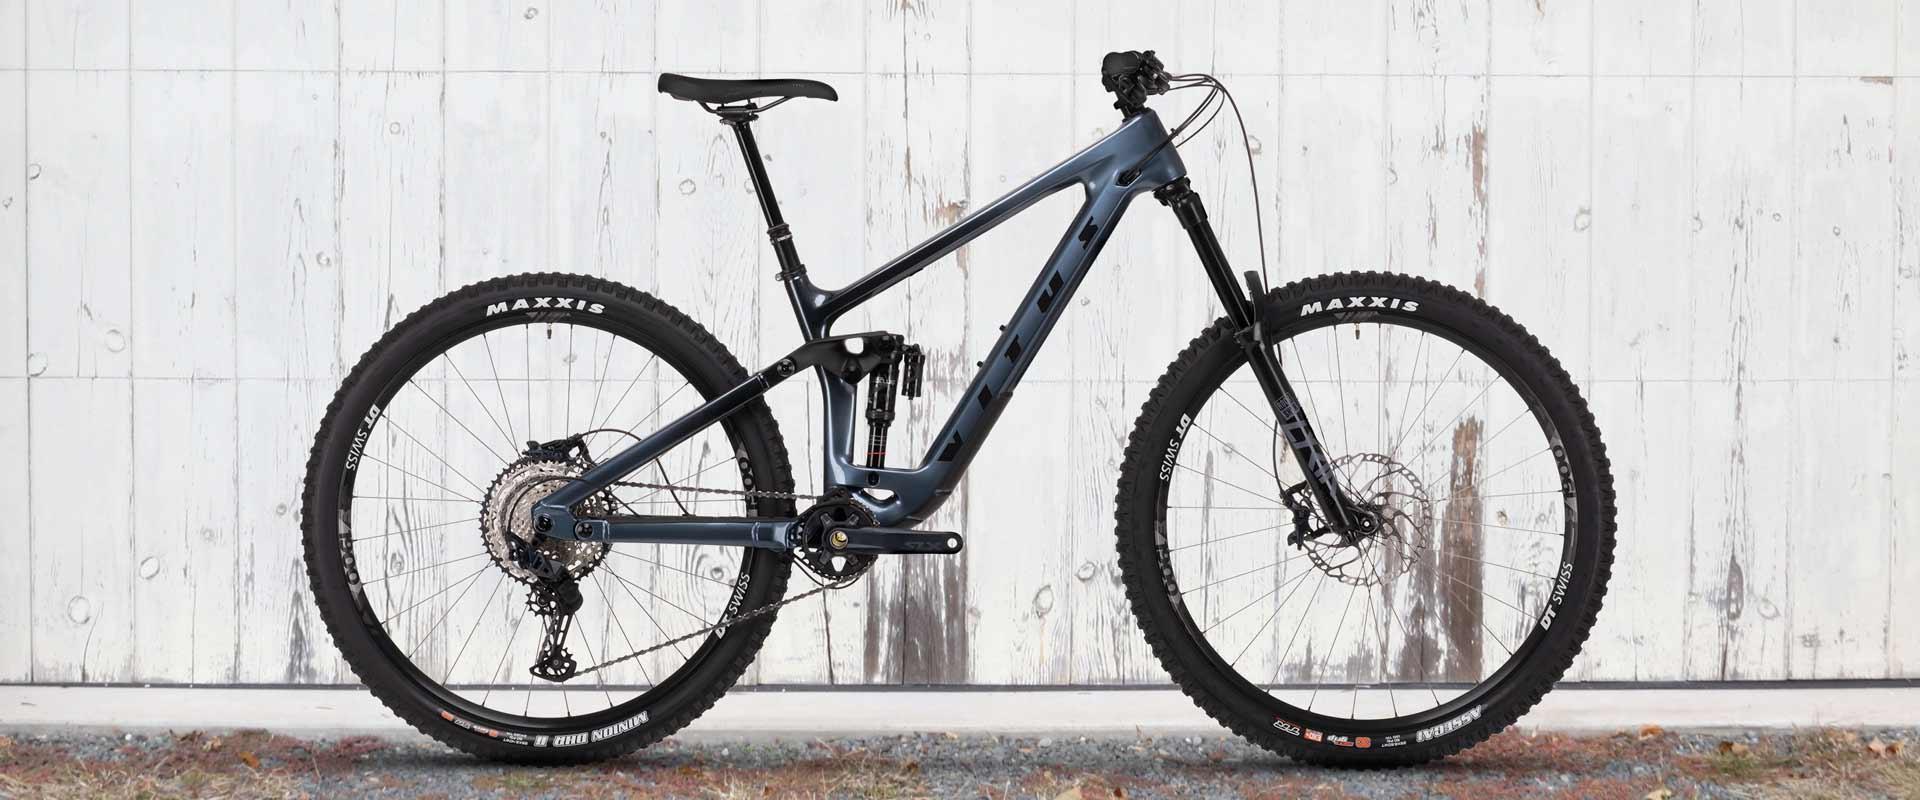 Vitus Sommet 29 CRS Mountain Bike